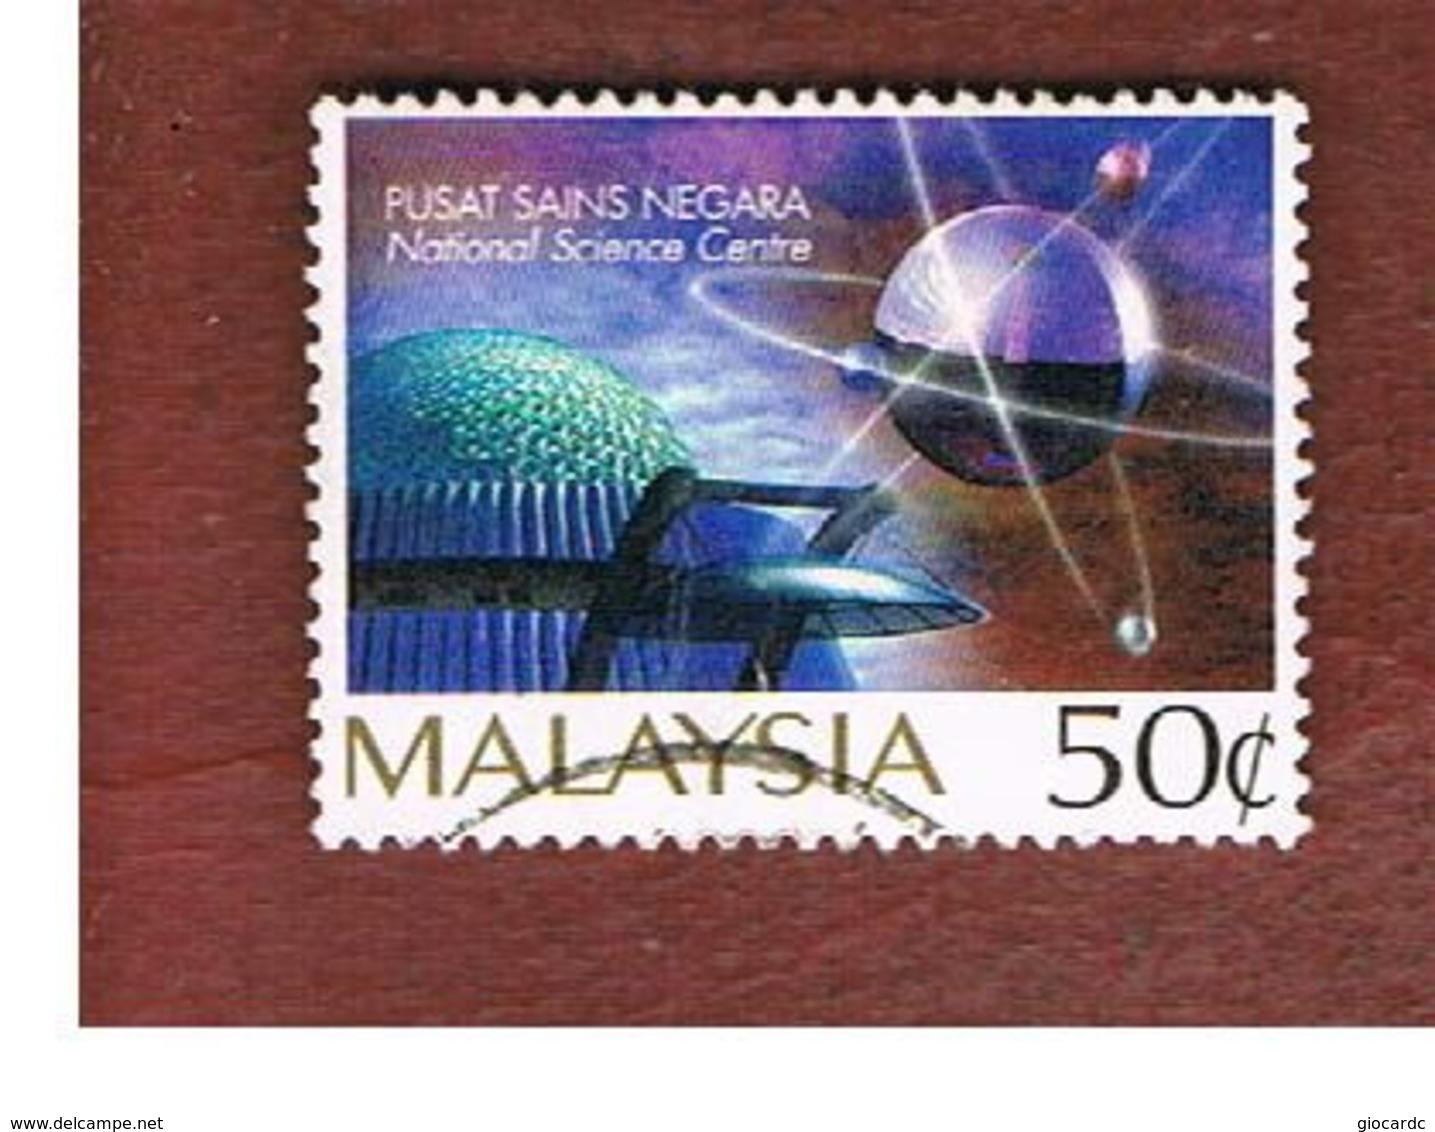 MALESIA (MALAYSIA)  -  SG 624  -   1996 NATIONAL SCIENCES CENTRE  -  USED ° - Malesia (1964-...)